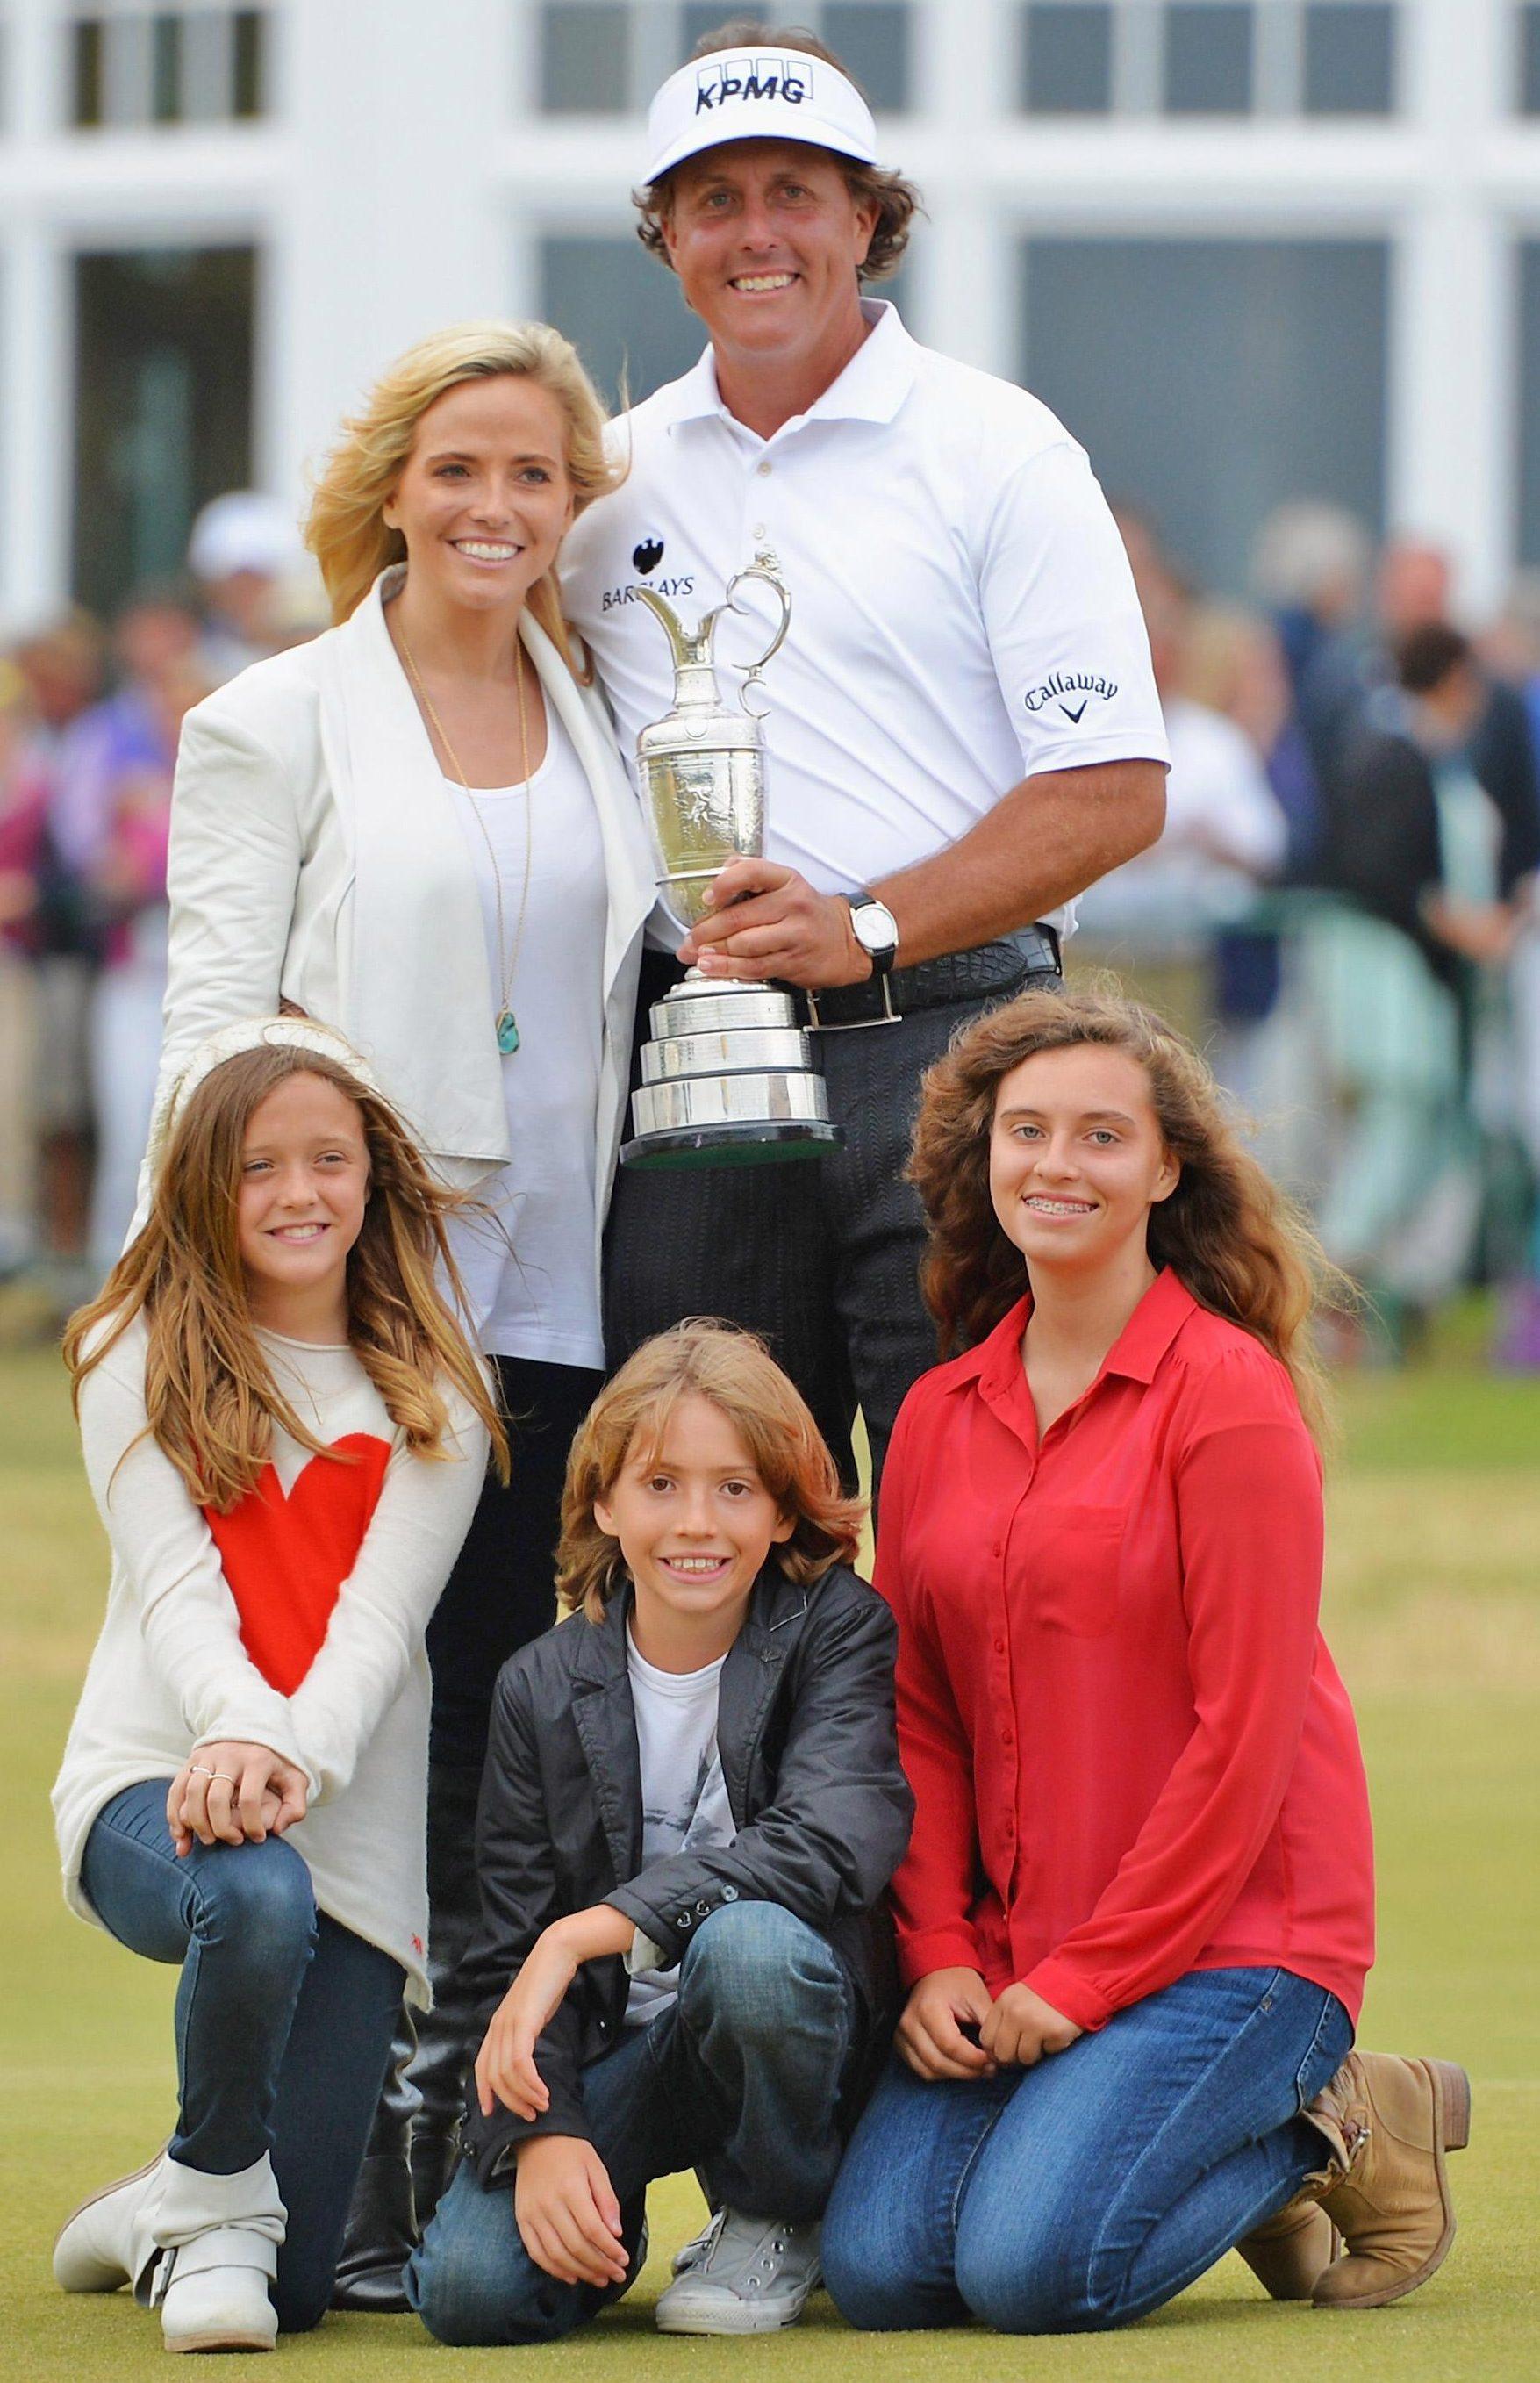 The couple have three children, Amanda, Sophia and Evan